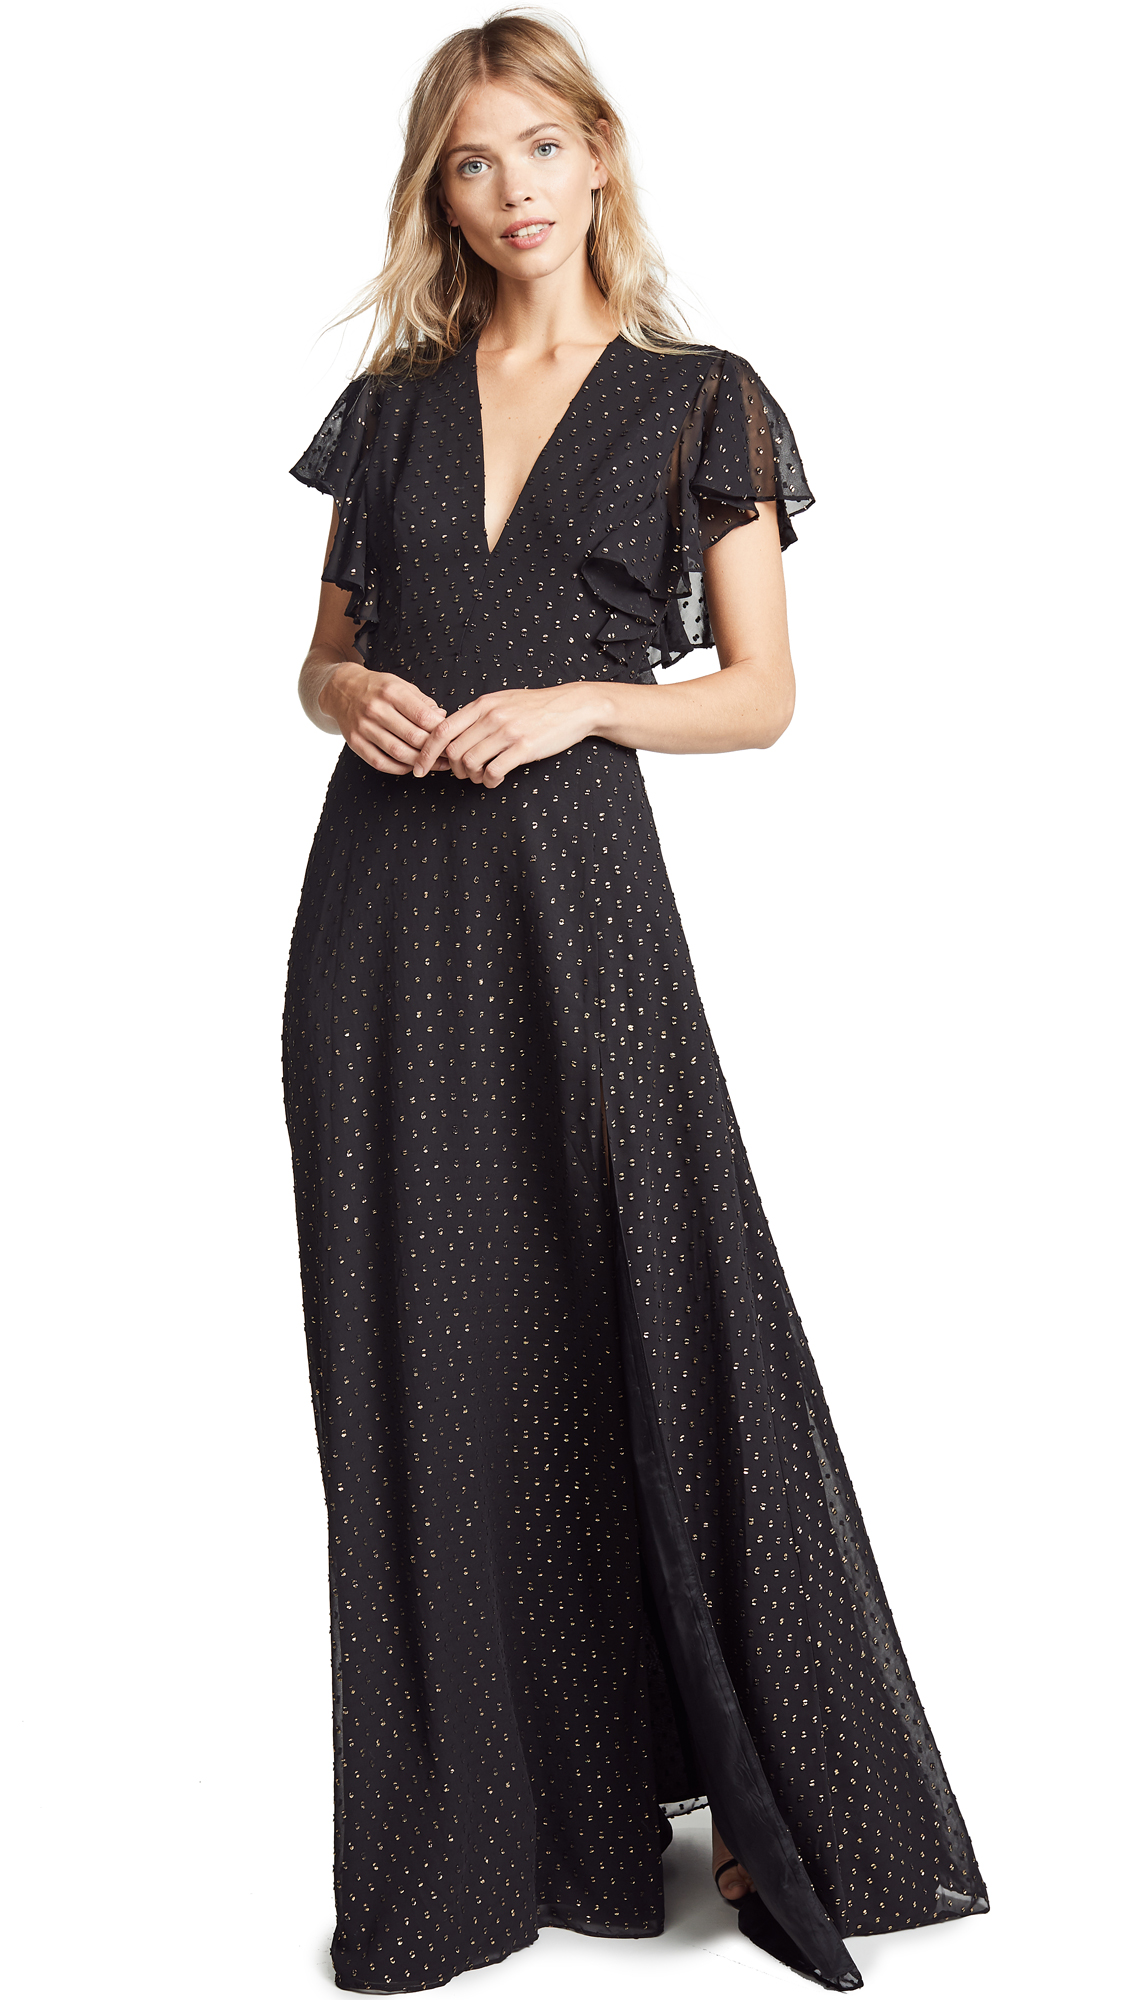 Jill Jill Stuart V Neck Metallic Gown - Black/Gold